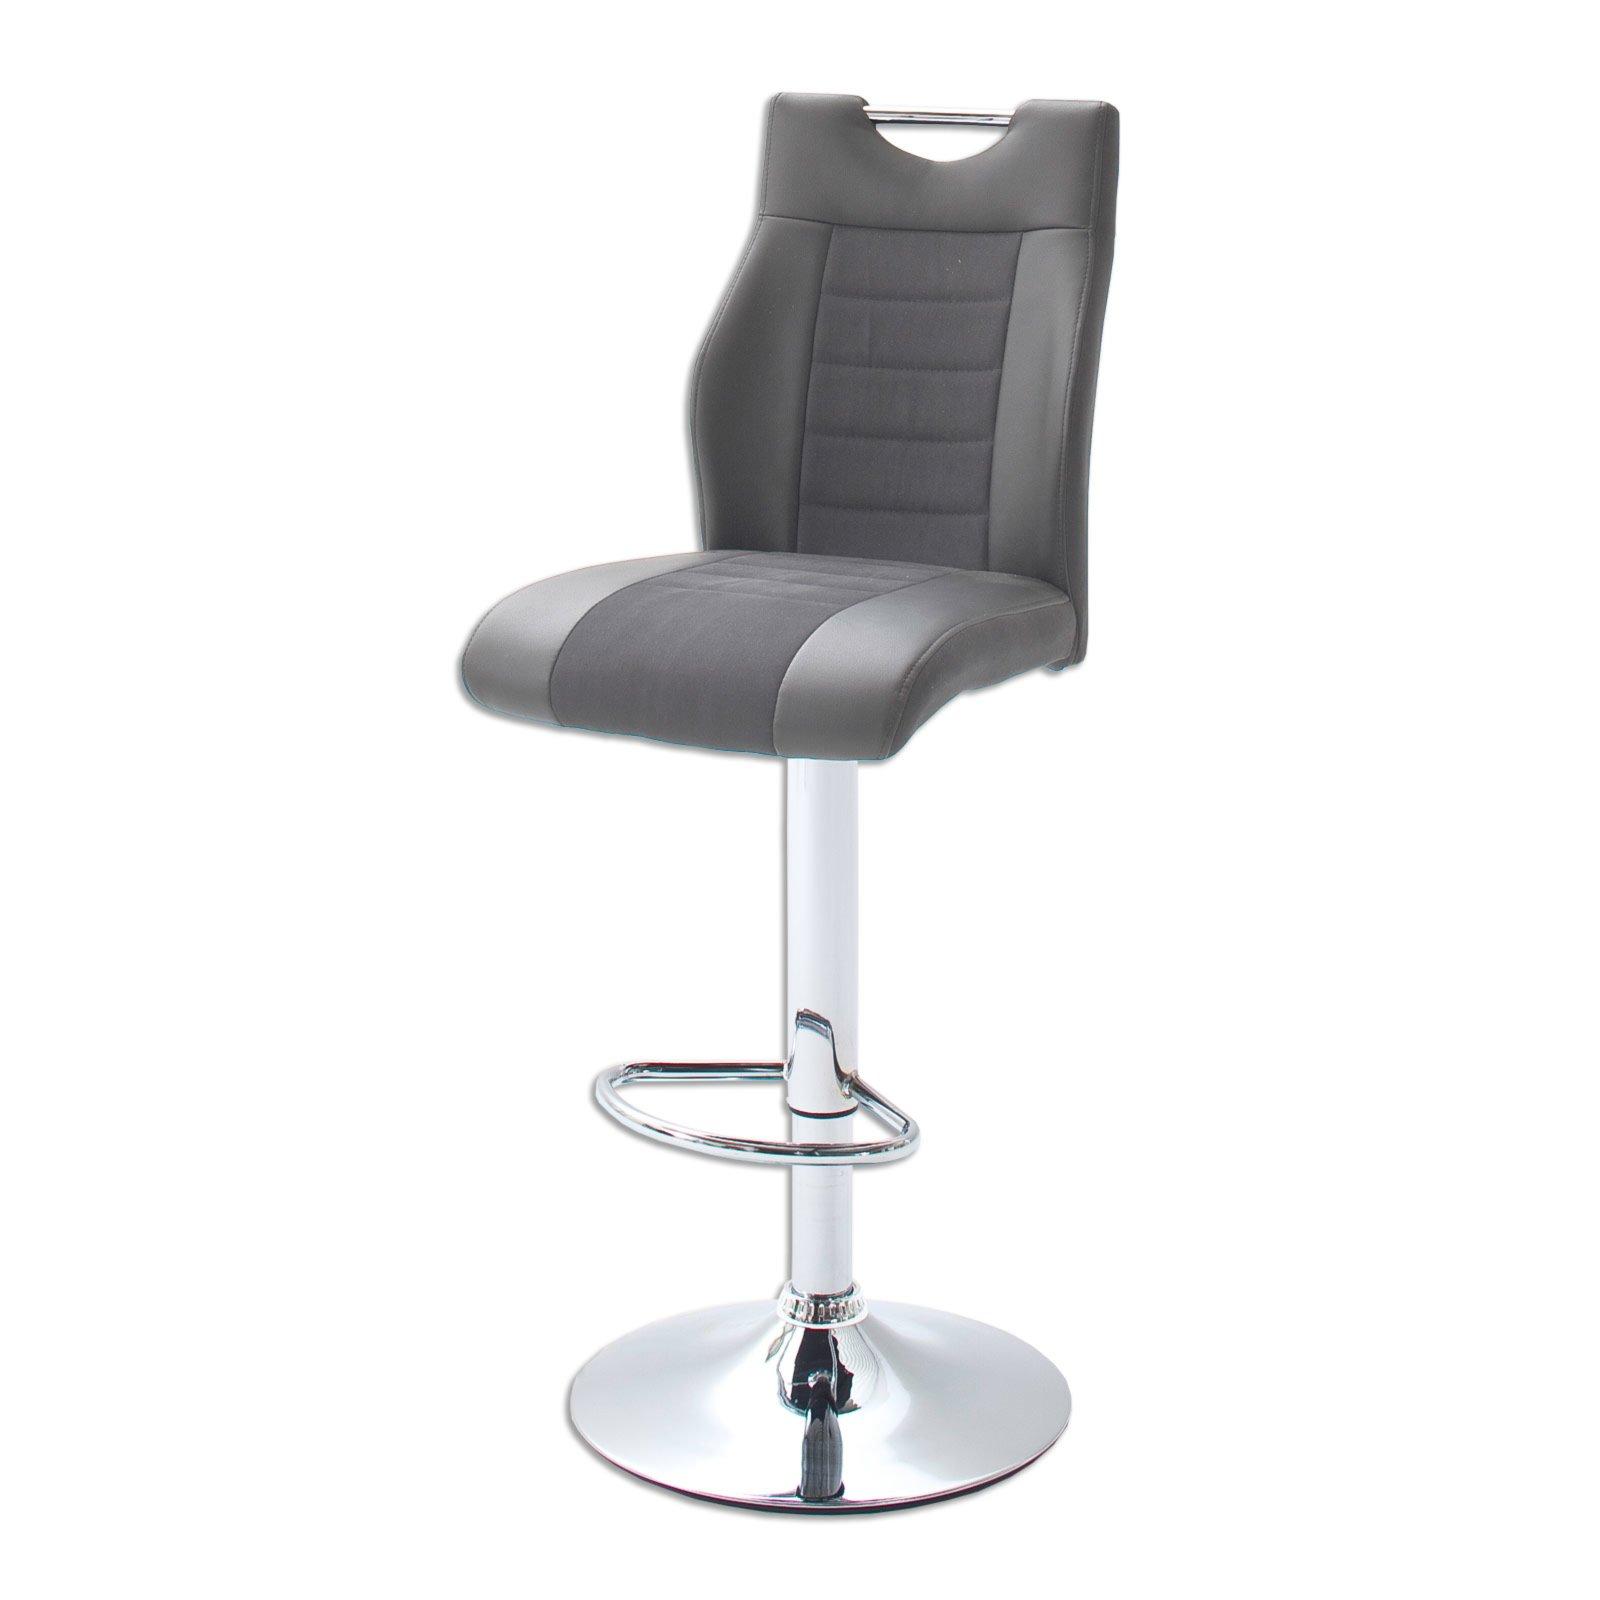 barhocker tito 2 grau h henverstellbar barhocker. Black Bedroom Furniture Sets. Home Design Ideas